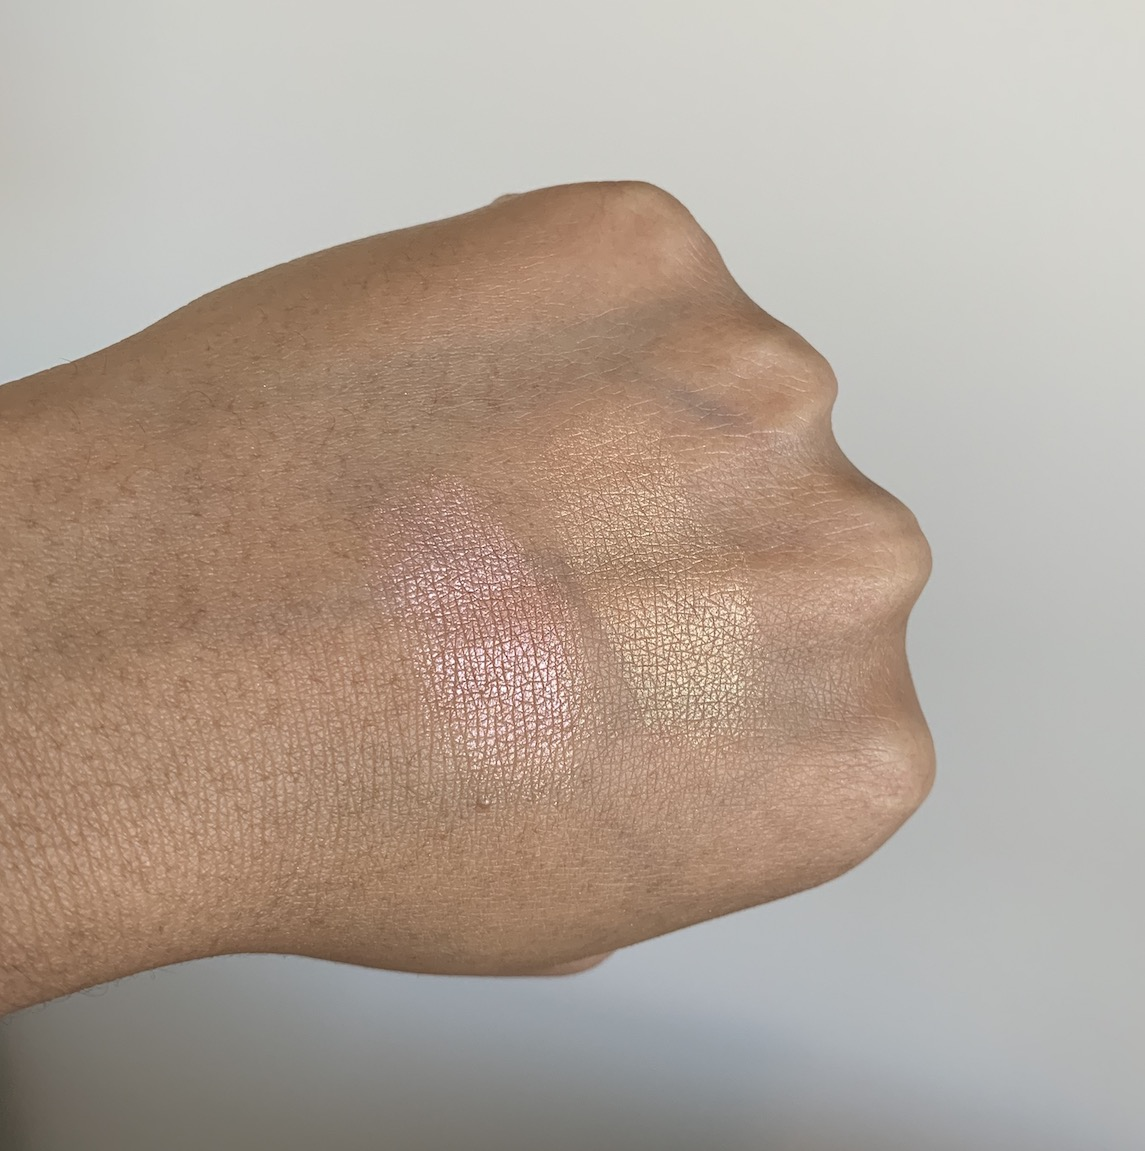 NARS Highlighting Powder in Maldives and Ibiza swatches on medium dark skin NC44/NC45